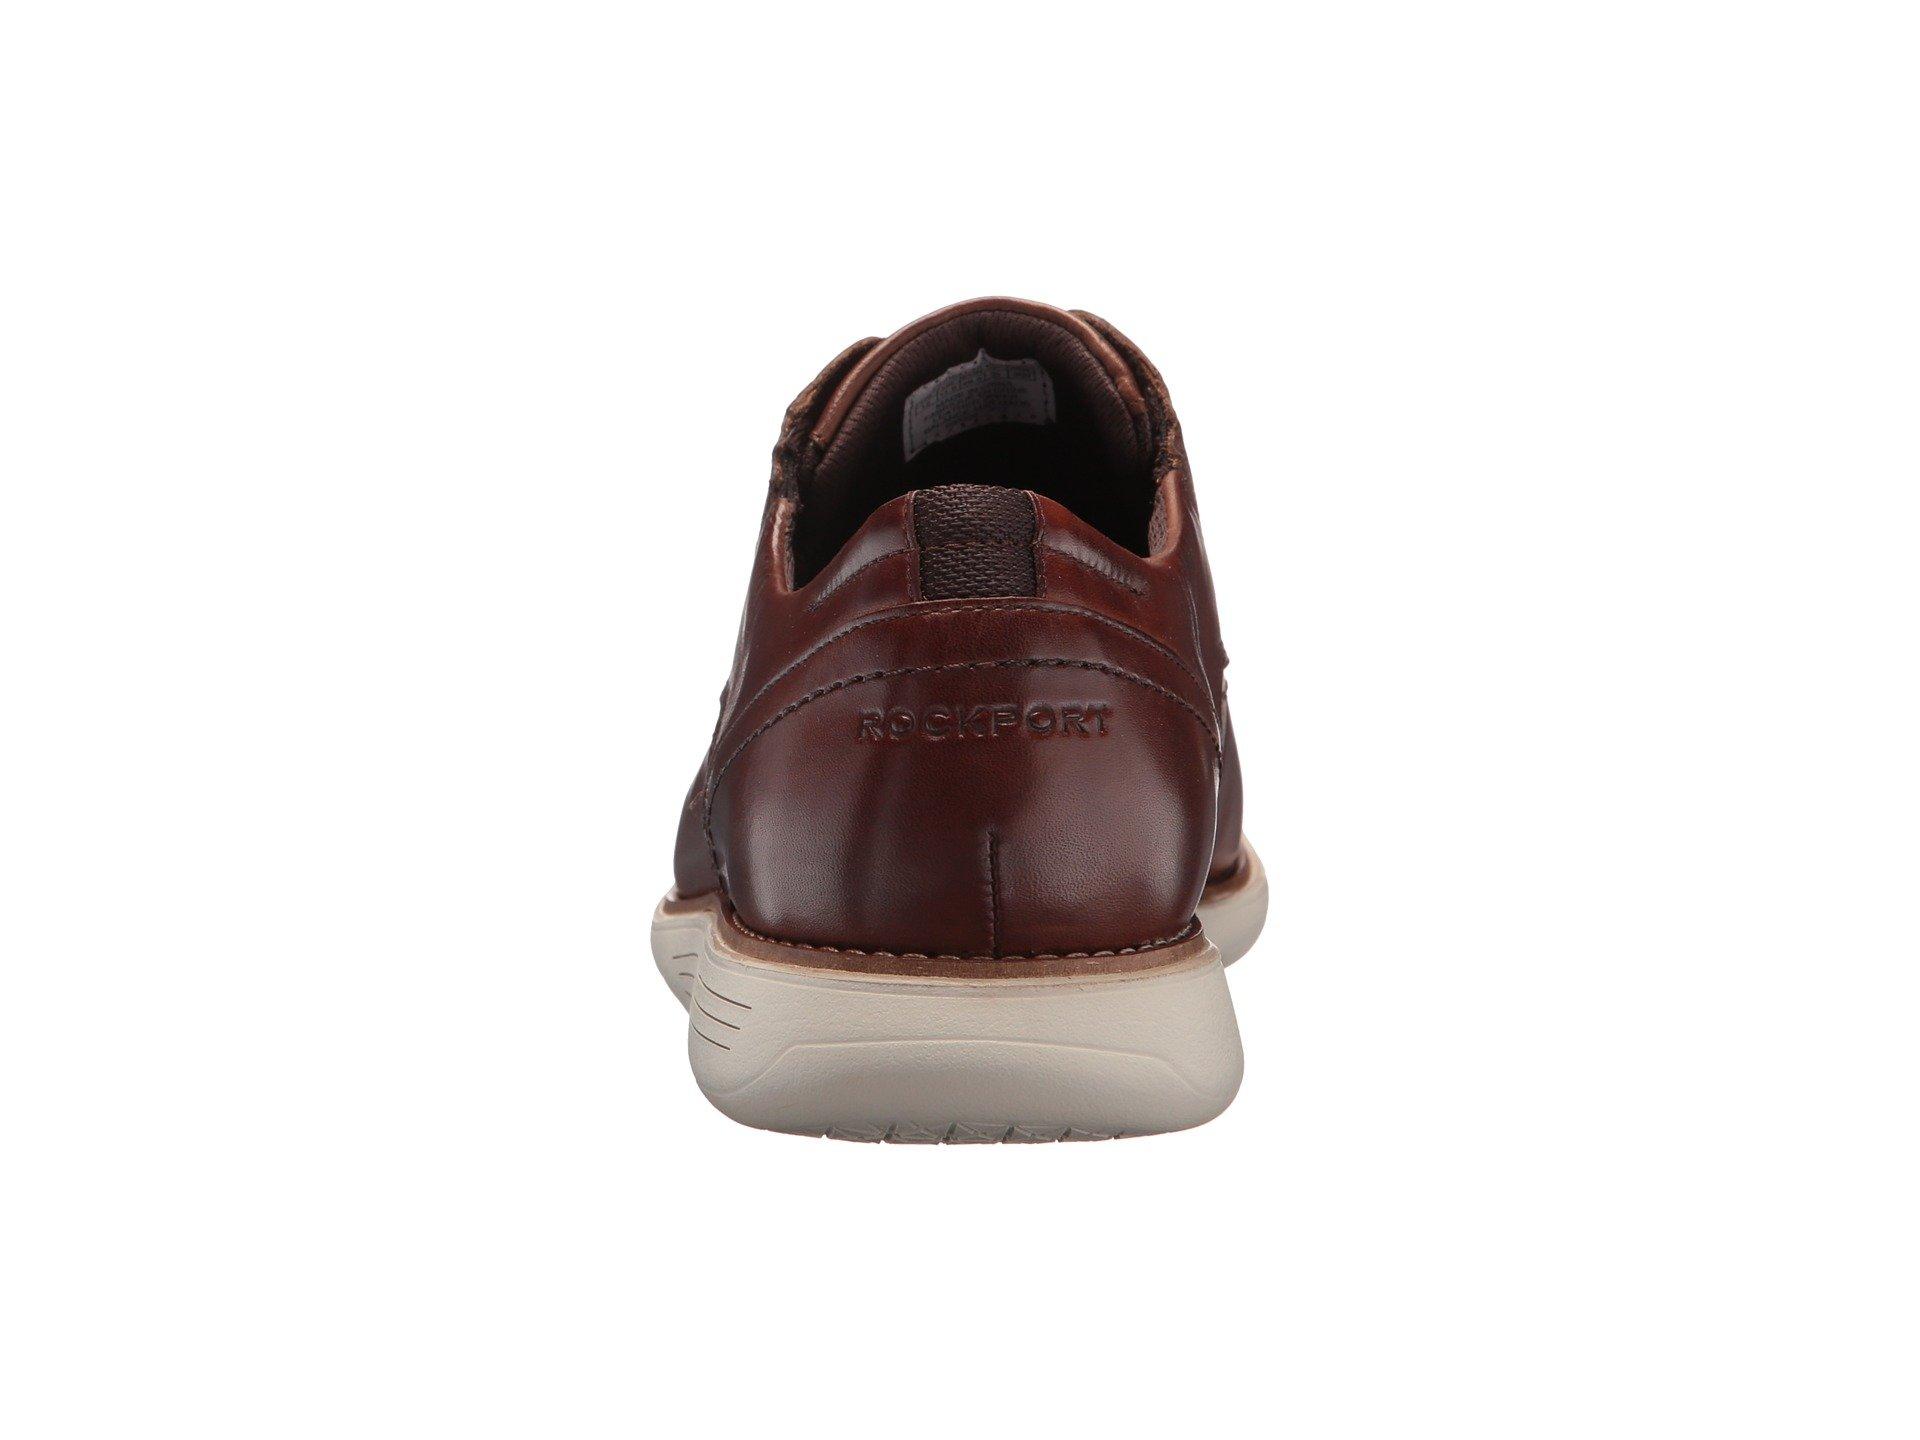 Leather Tan Dress Plain Rockport Total Motion Toe Sports gcZ1t4vWq